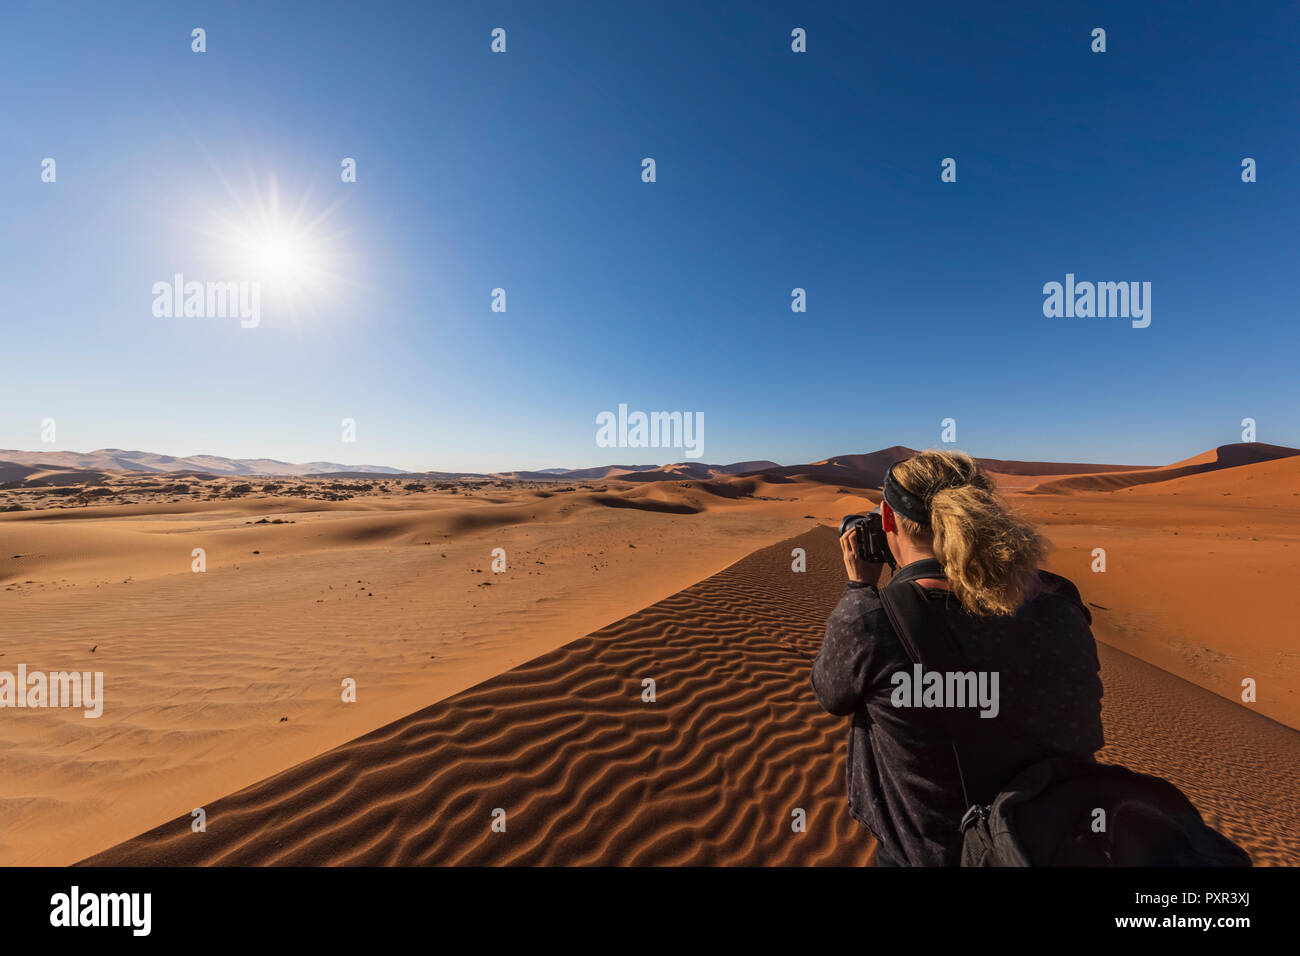 Africa, Namibia, Namib desert, Naukluft National Park, female photograper - Stock Image